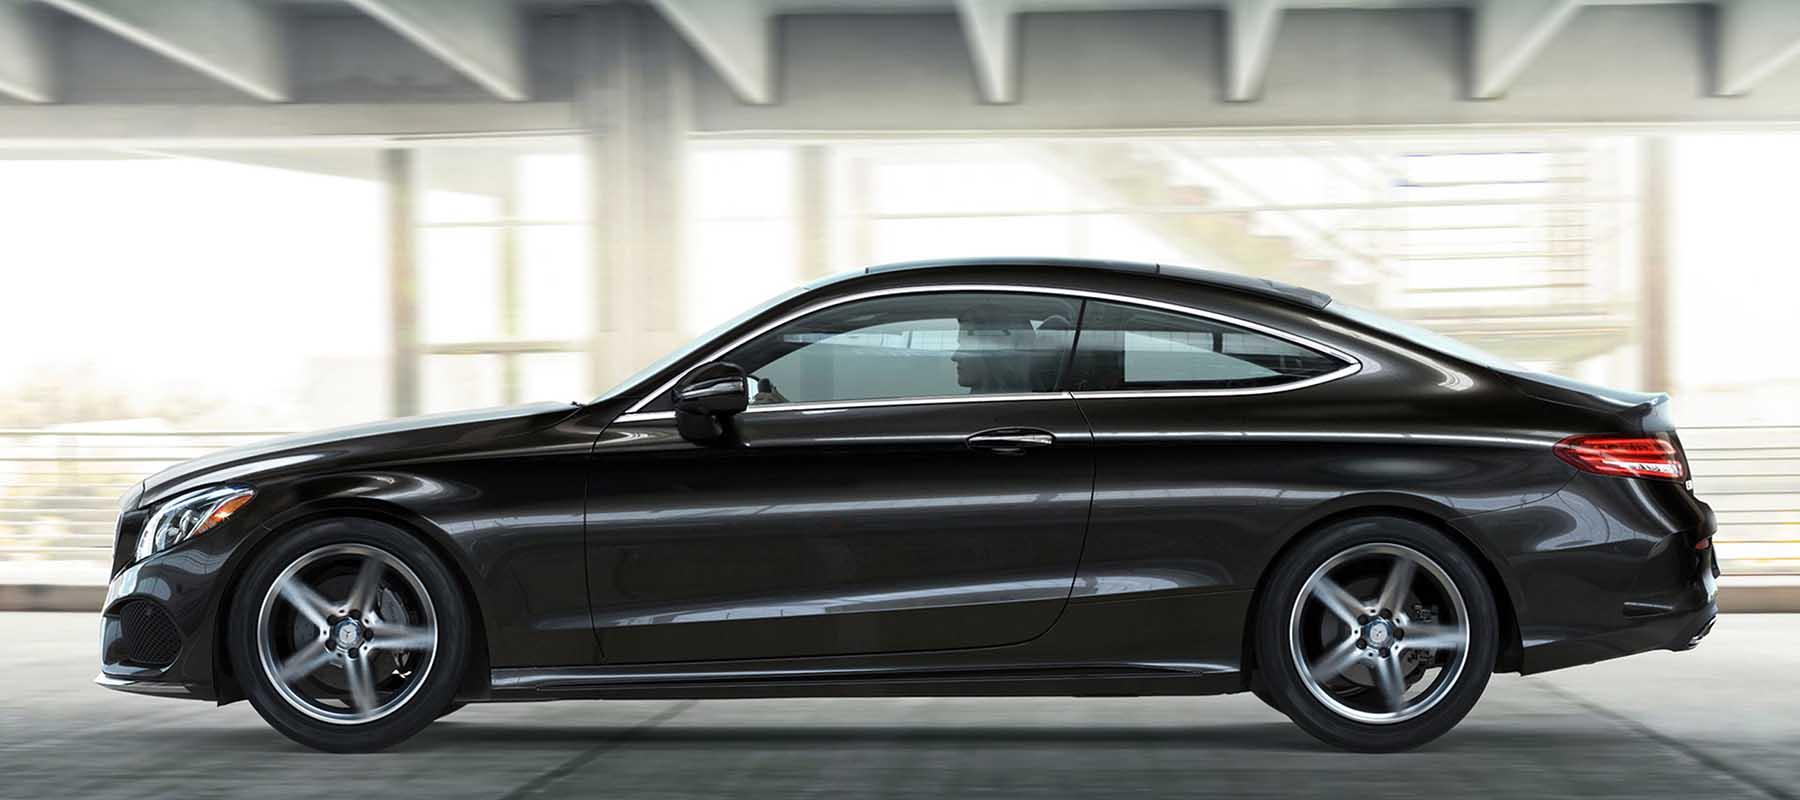 2017 mercedes benz c class coupe models overview for Mercedes benz memphis